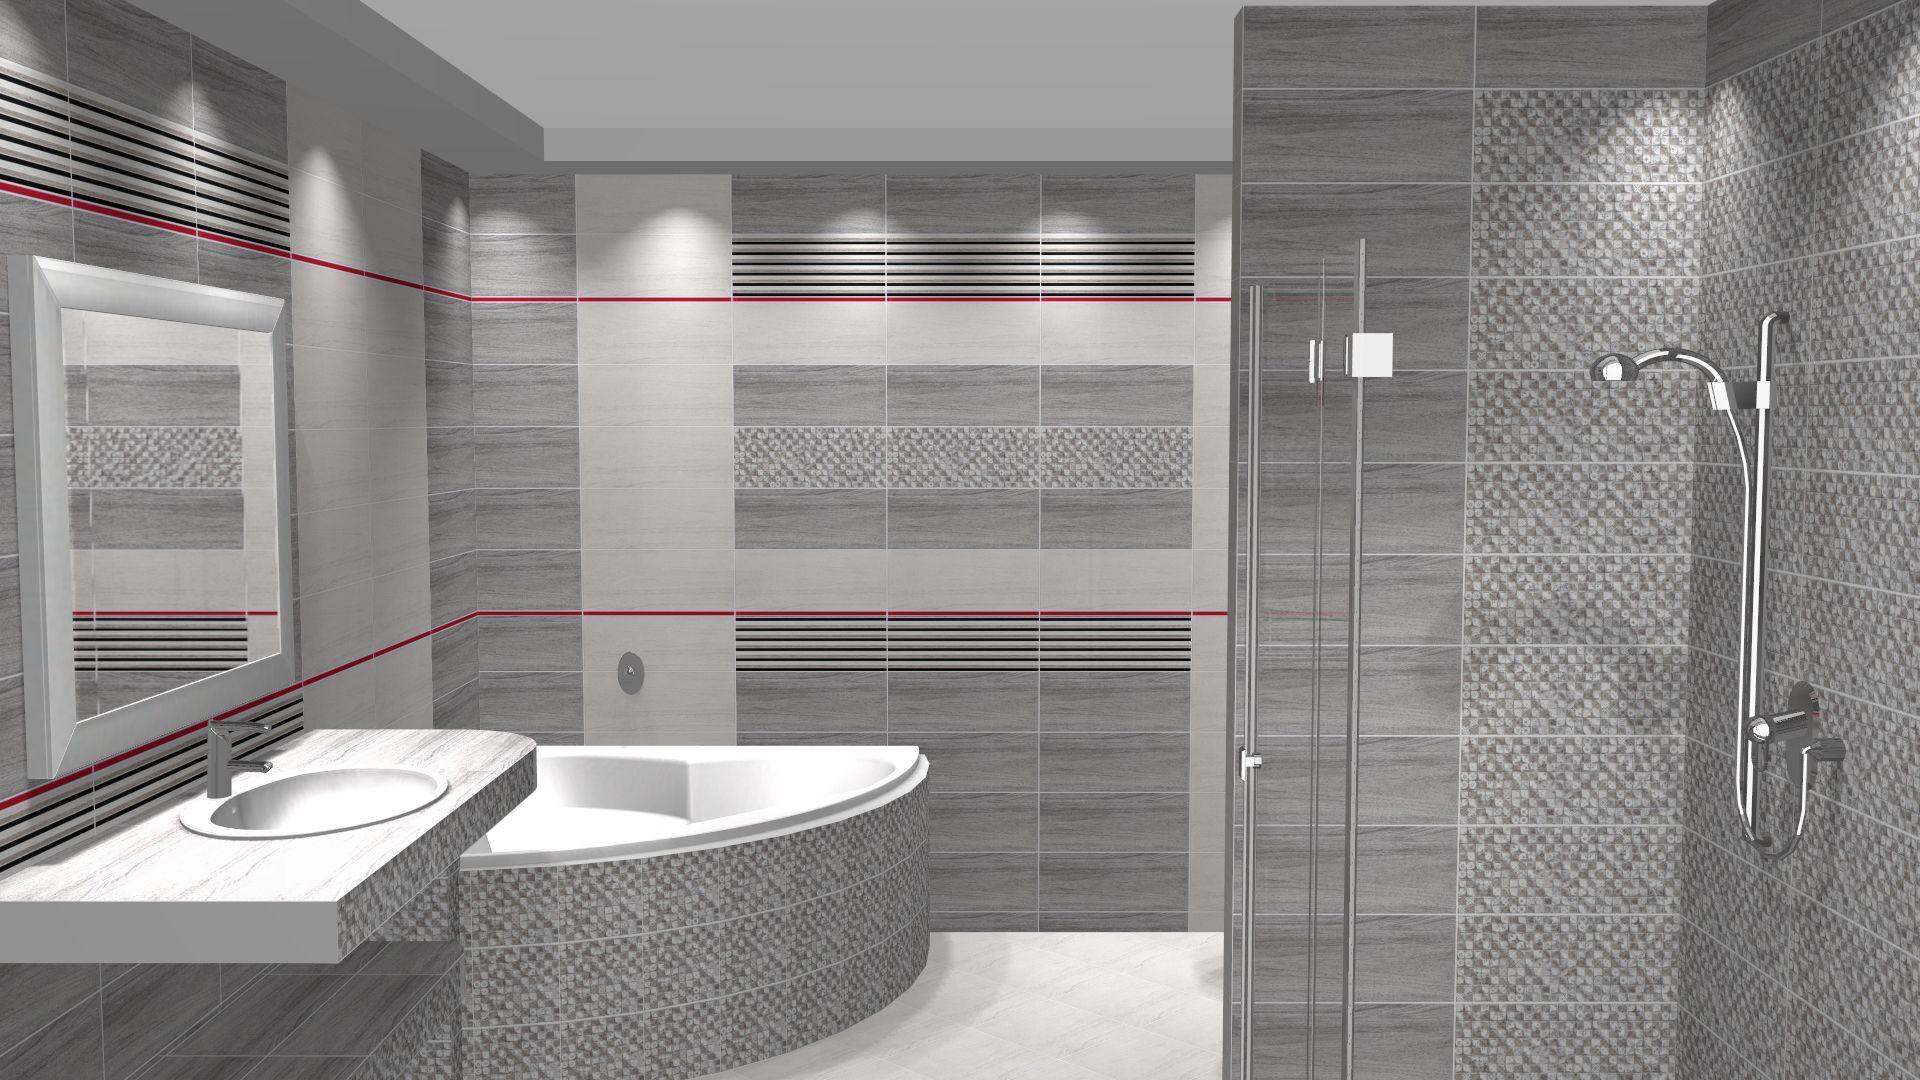 3421bd bathroom vanity ideas - 3421bd Bathroom Vanity Ideas 55